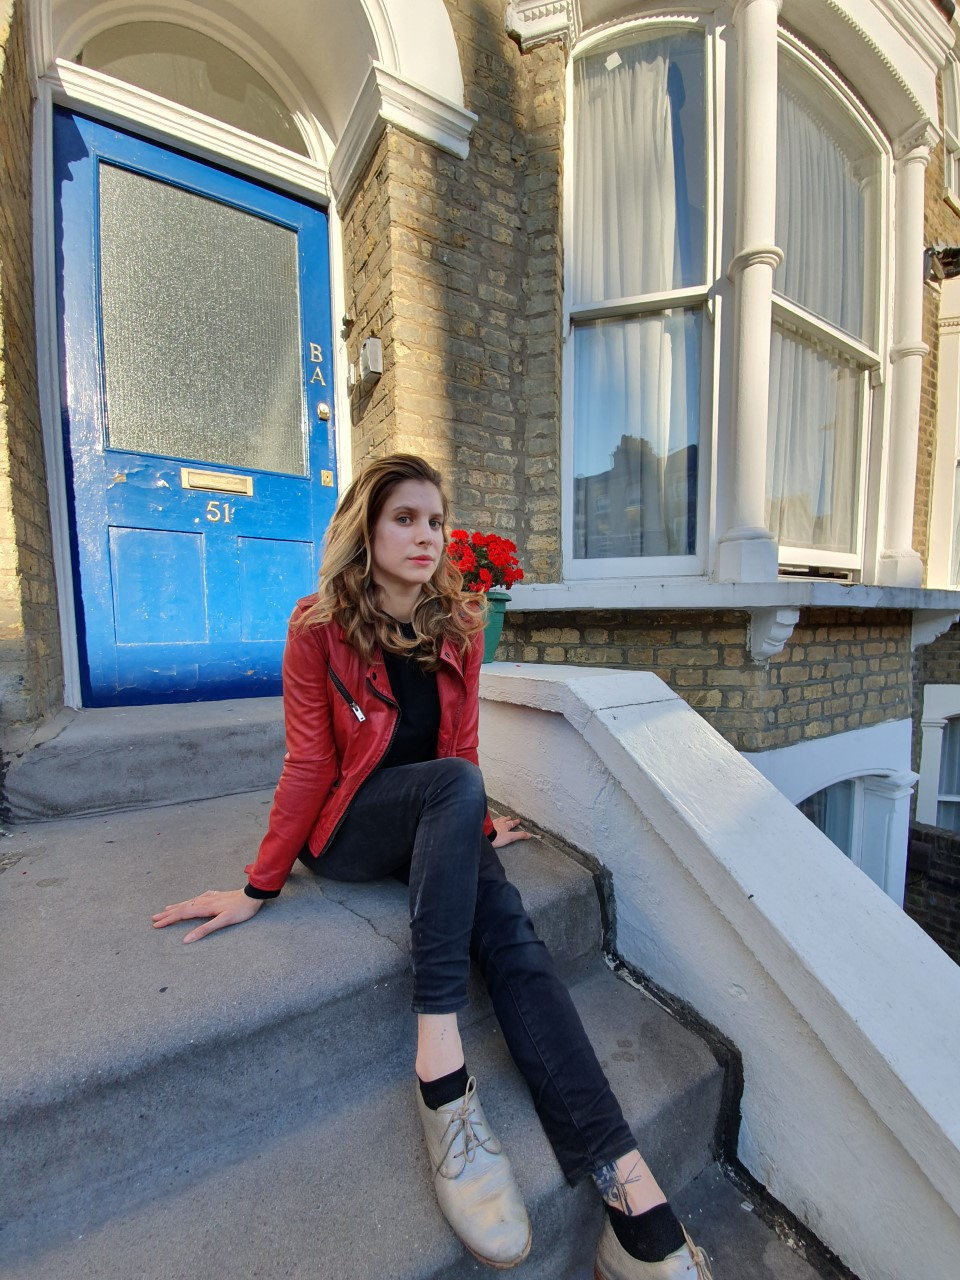 a woman sat on steps outside a blue door